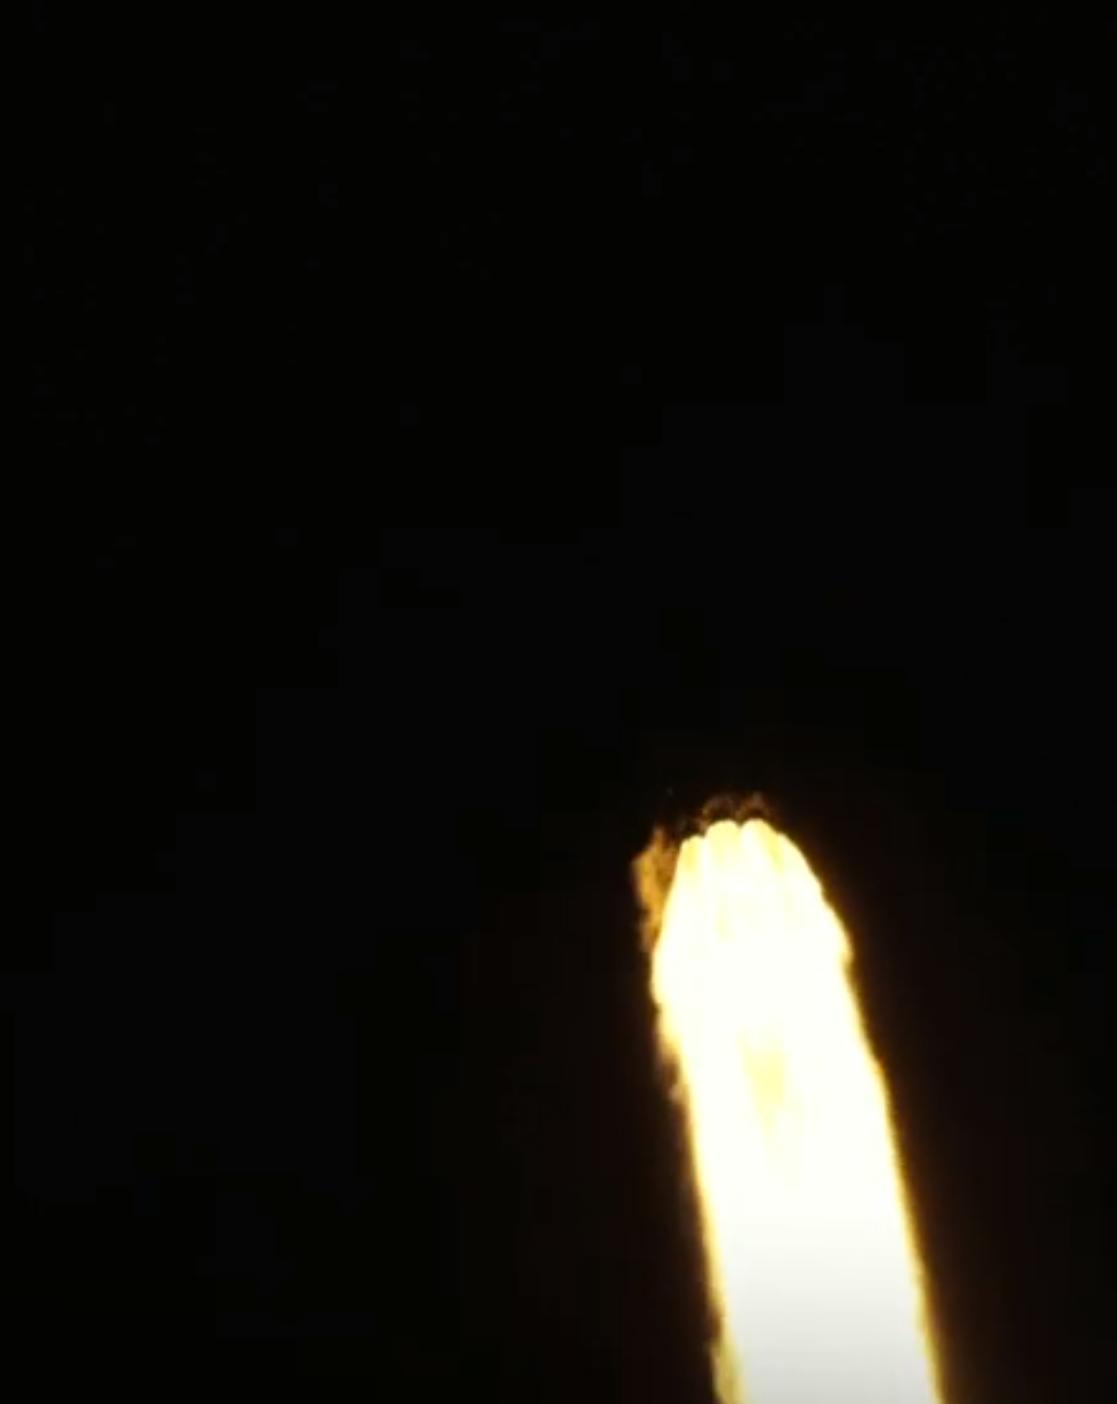 DM-1 Crew Dragon Falcon 9 B1051 launch (SpaceX) webcast 4